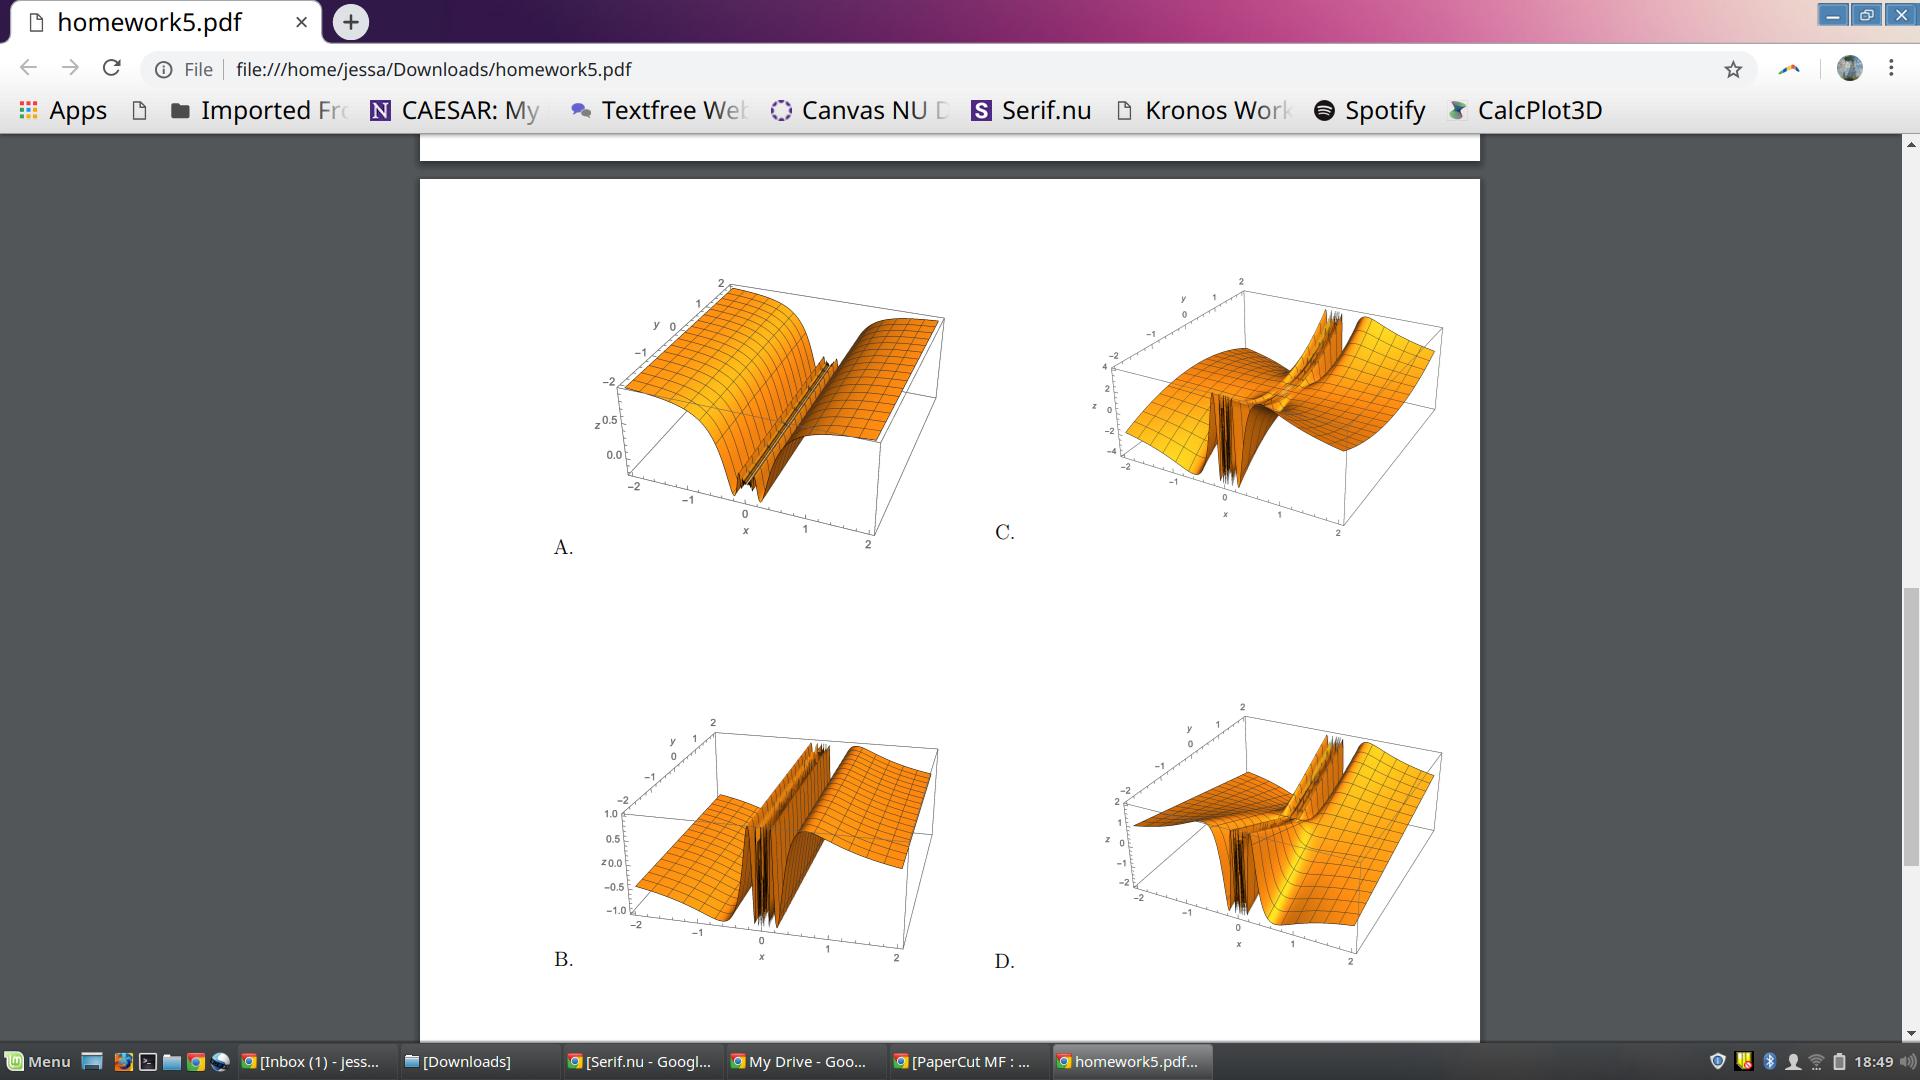 D homework5.pdf x+ ← → ⓘ File file:///home/jessa/Downloads/homework5.pdf Apps Imported Fre N CAESAR: My Textfree We ) Canvas NU S Serif.nu D Kronos Work Spotify CalcPlot3D 0.5 0.0 1.0 0.5 z0.0 -0.5 OMenu- 圉囚一回包 间[Inbox (1)-Jess...-[Downloads] serif.nu-Googl İ My Drive-Goo.. PaperCut MF : g homework5.pdf